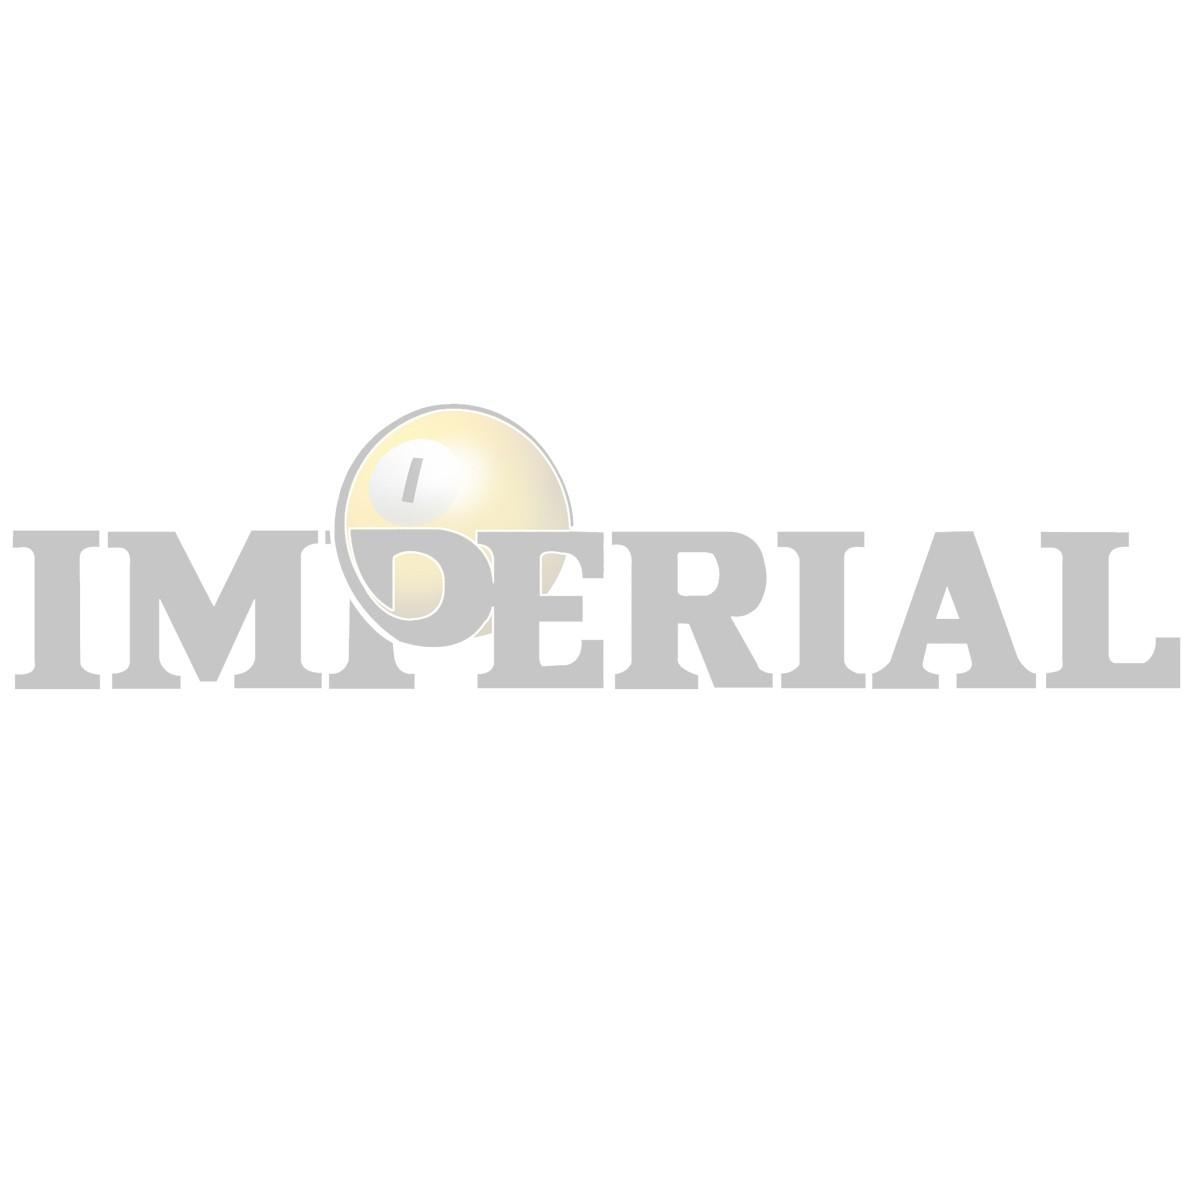 Kansas City Chiefs Home vs. Away Billiard Ball Set